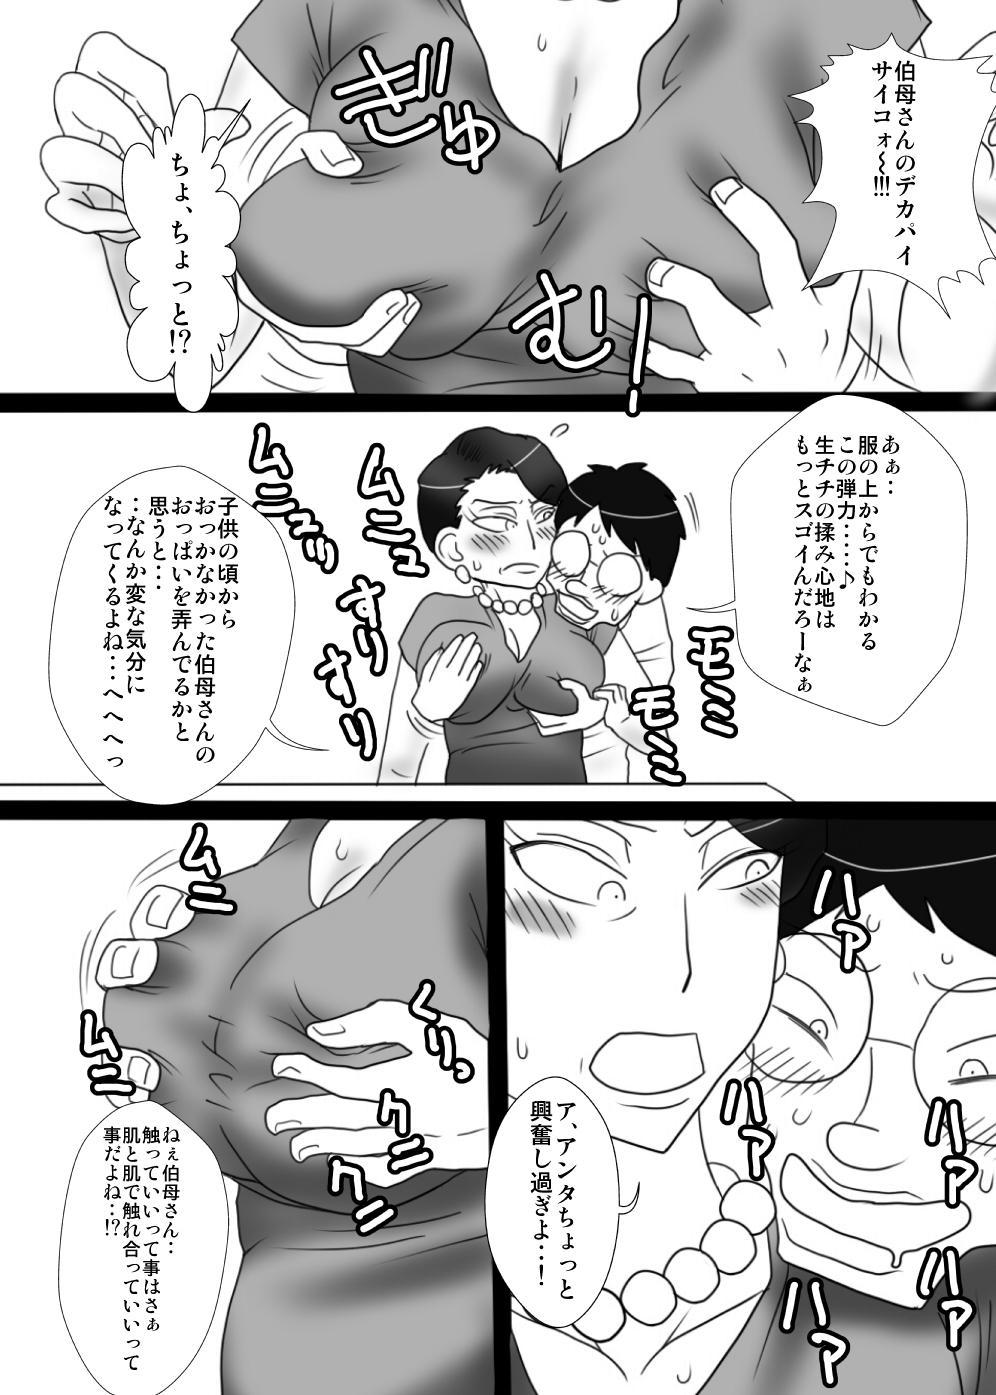 Oba-san o Otosuze! 8